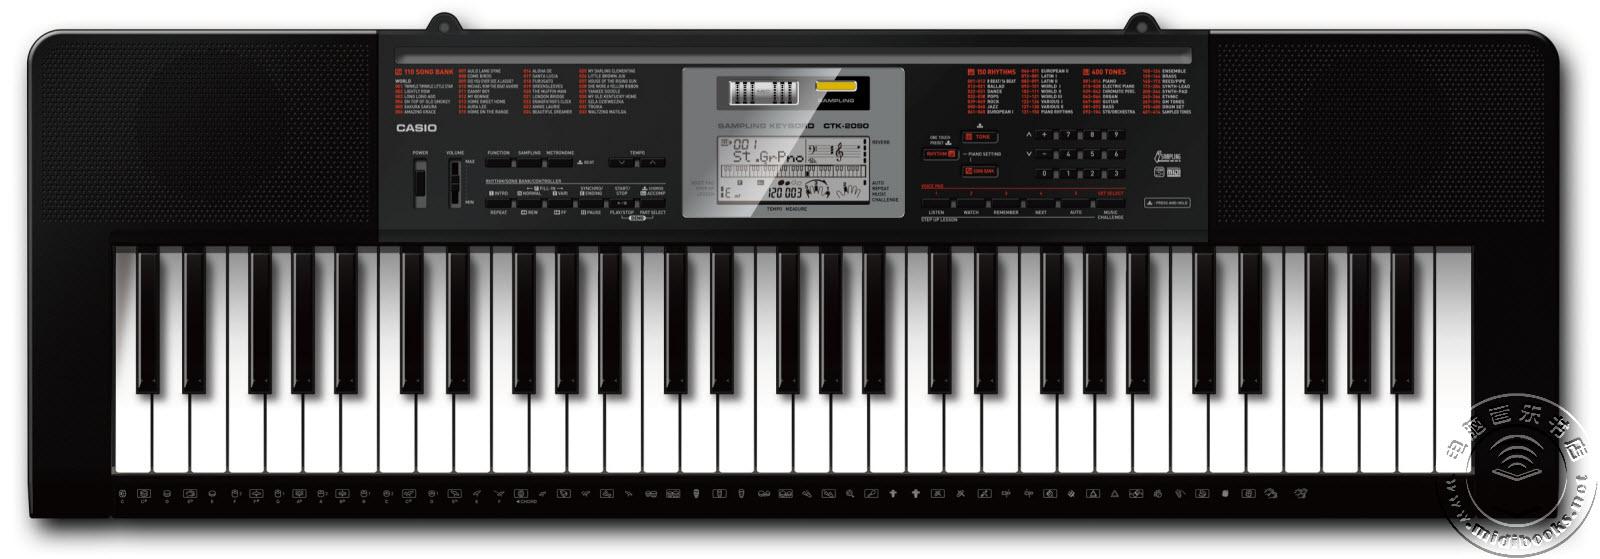 卡西欧(CASIO)发布CTK-2090和LK-175V采样键盘